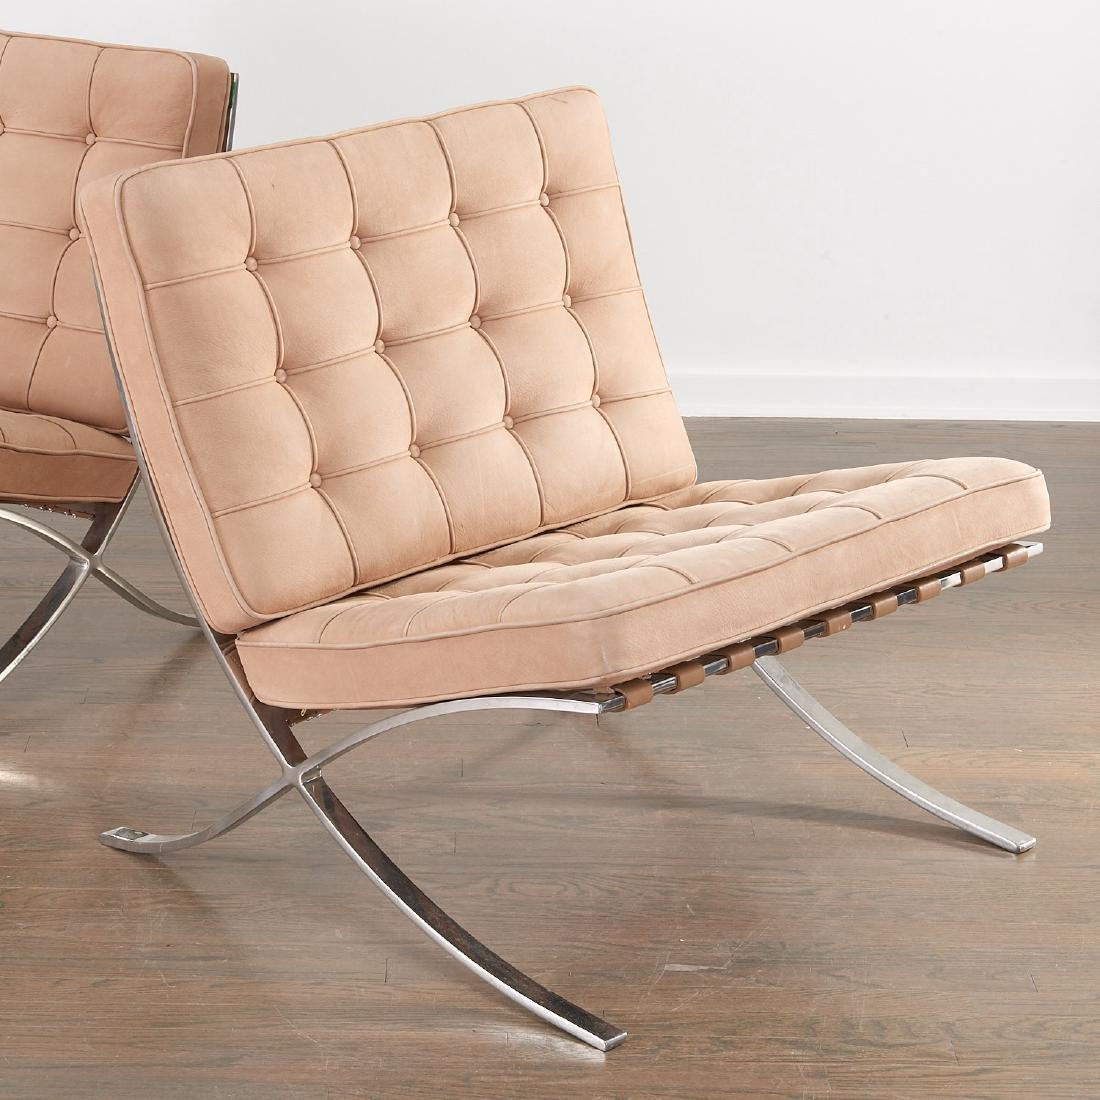 Pair Knoll Barcelona chairs - 4